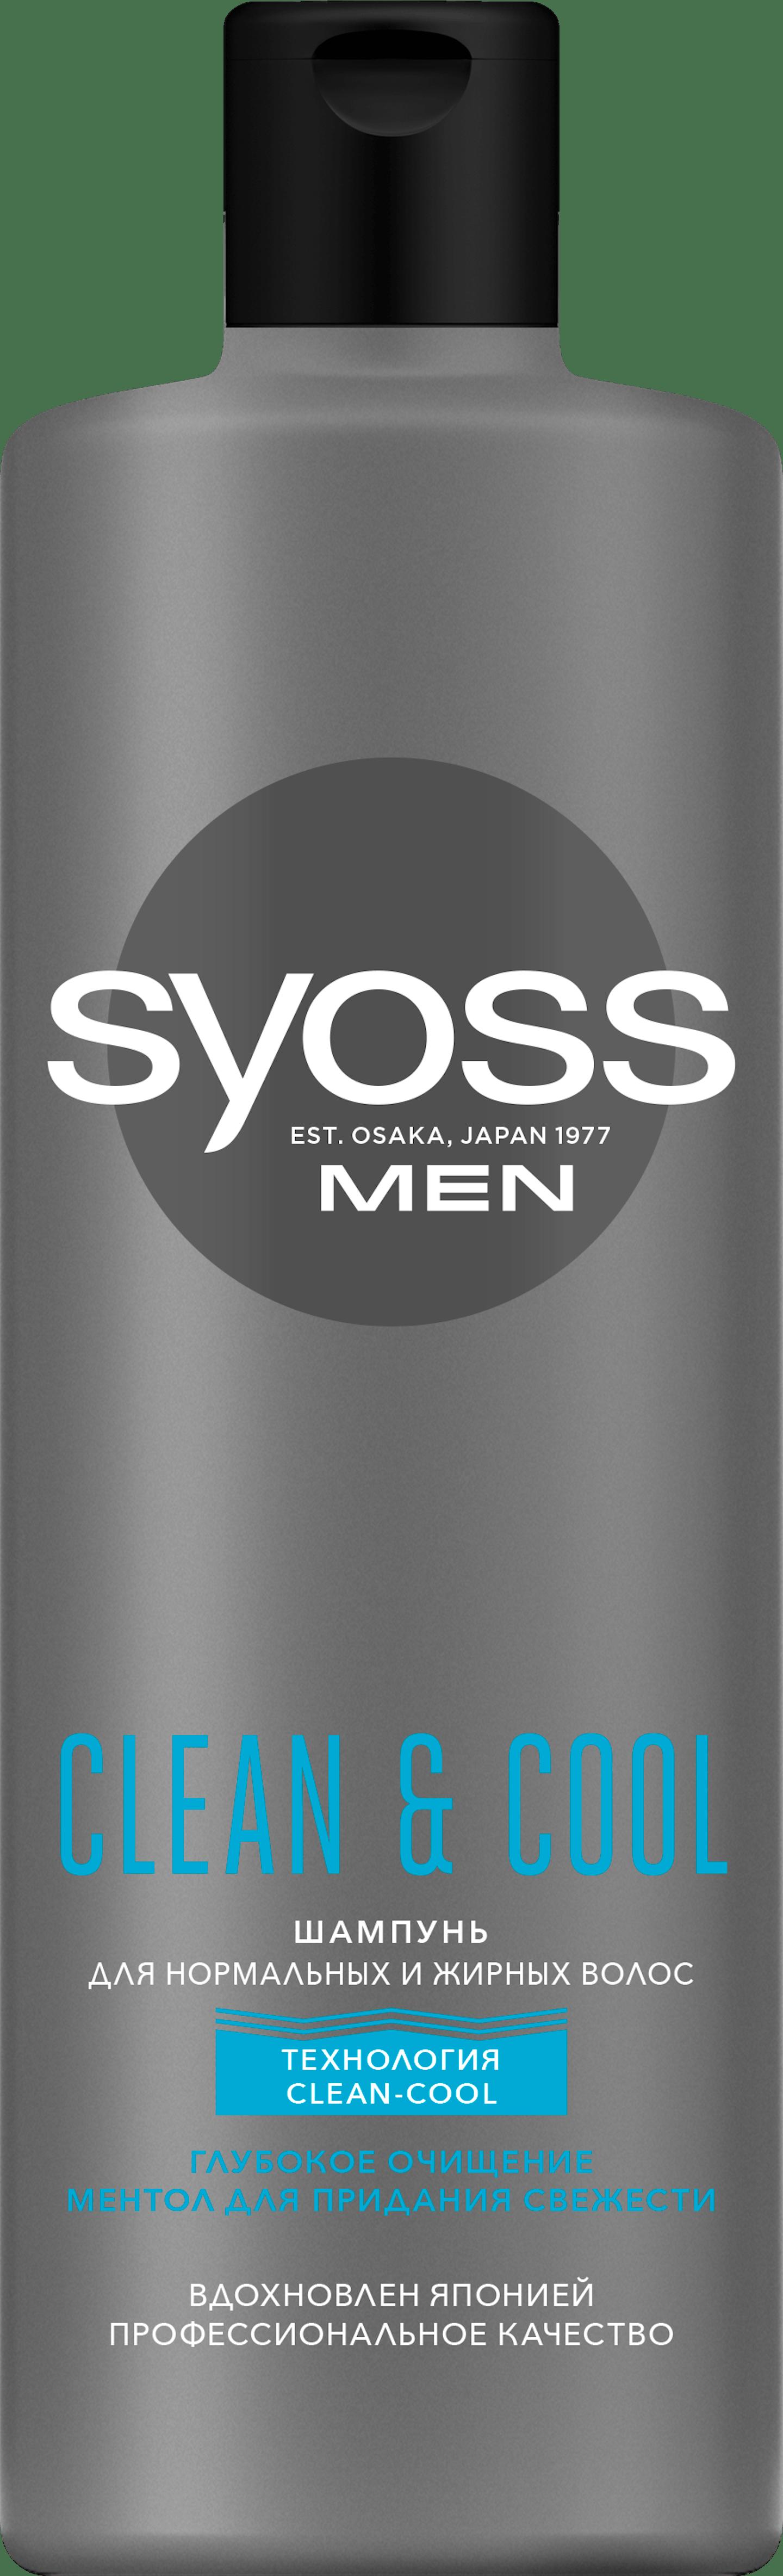 SYOSS MEN CLEAN&COOL ШАМПУНЬ